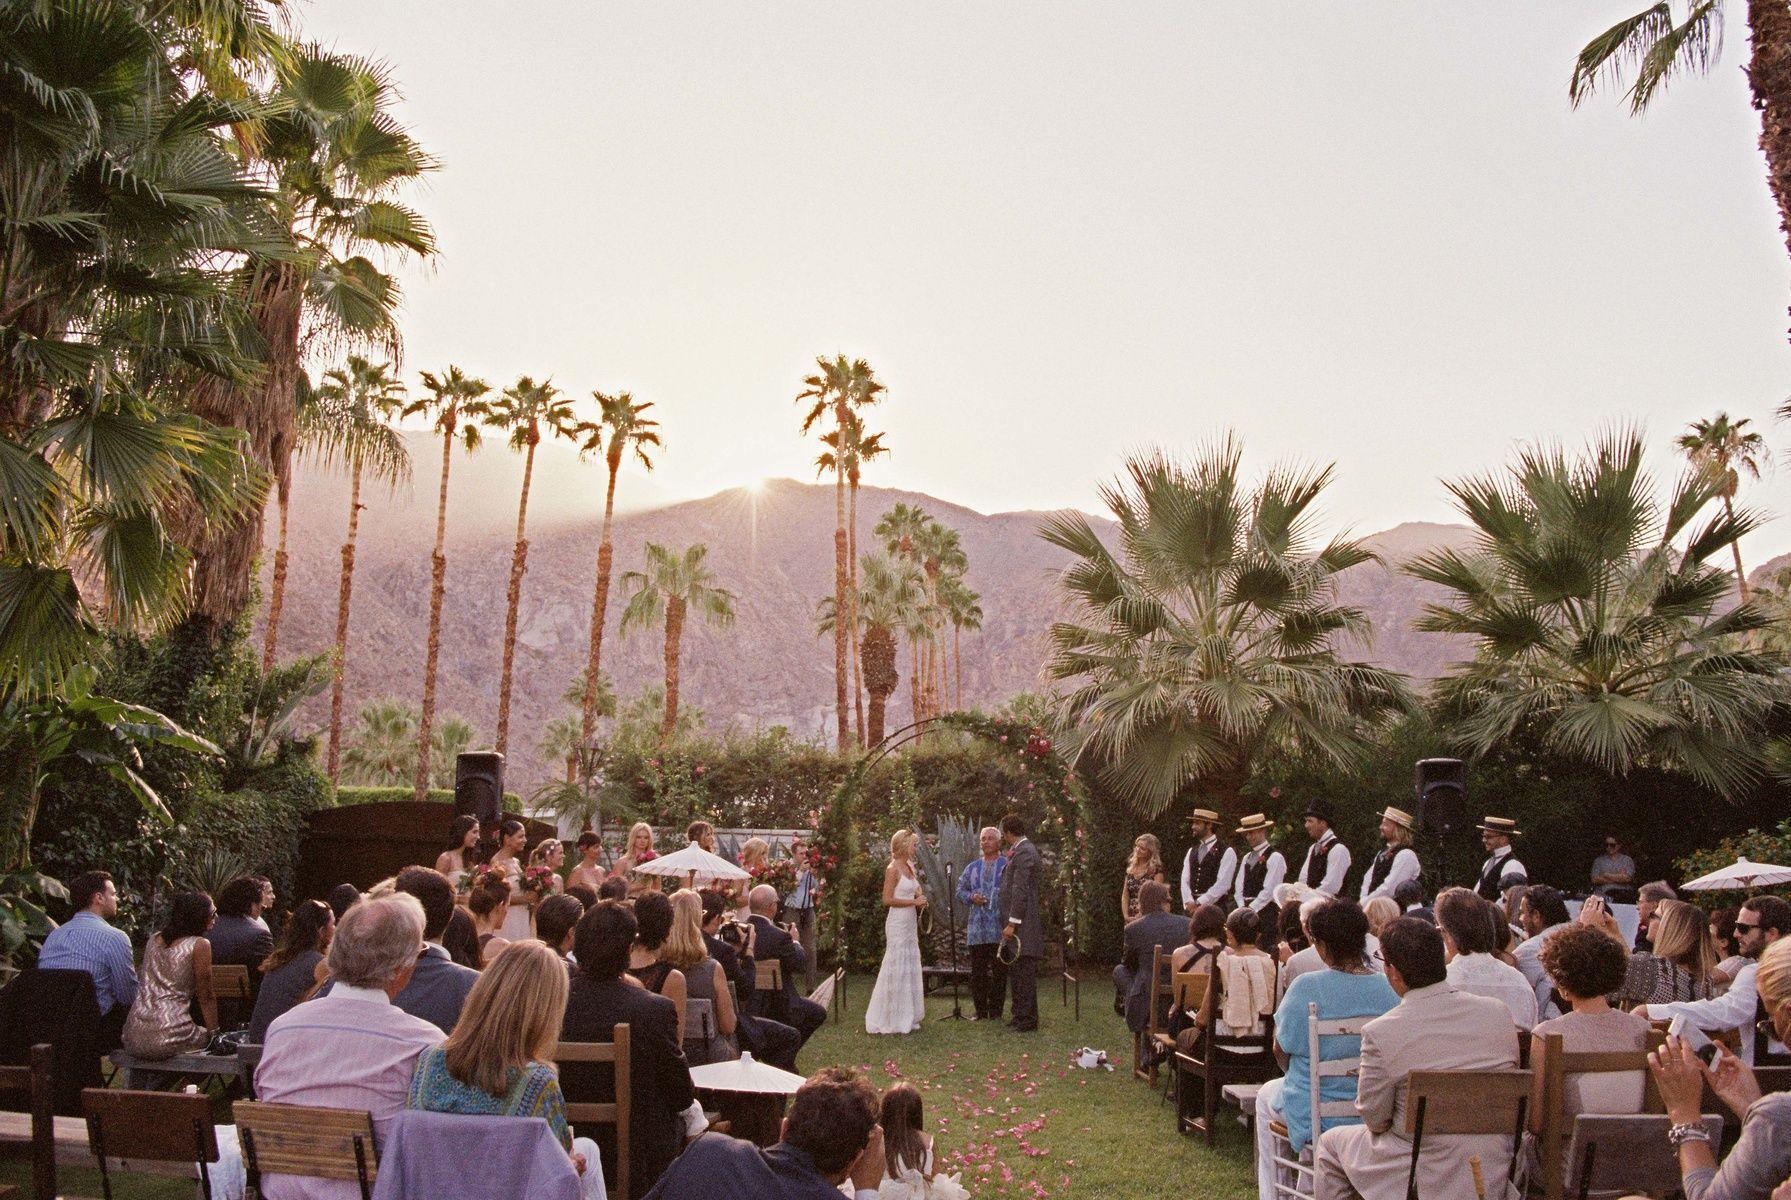 palm springs wedding at casa de monte vista palm springs